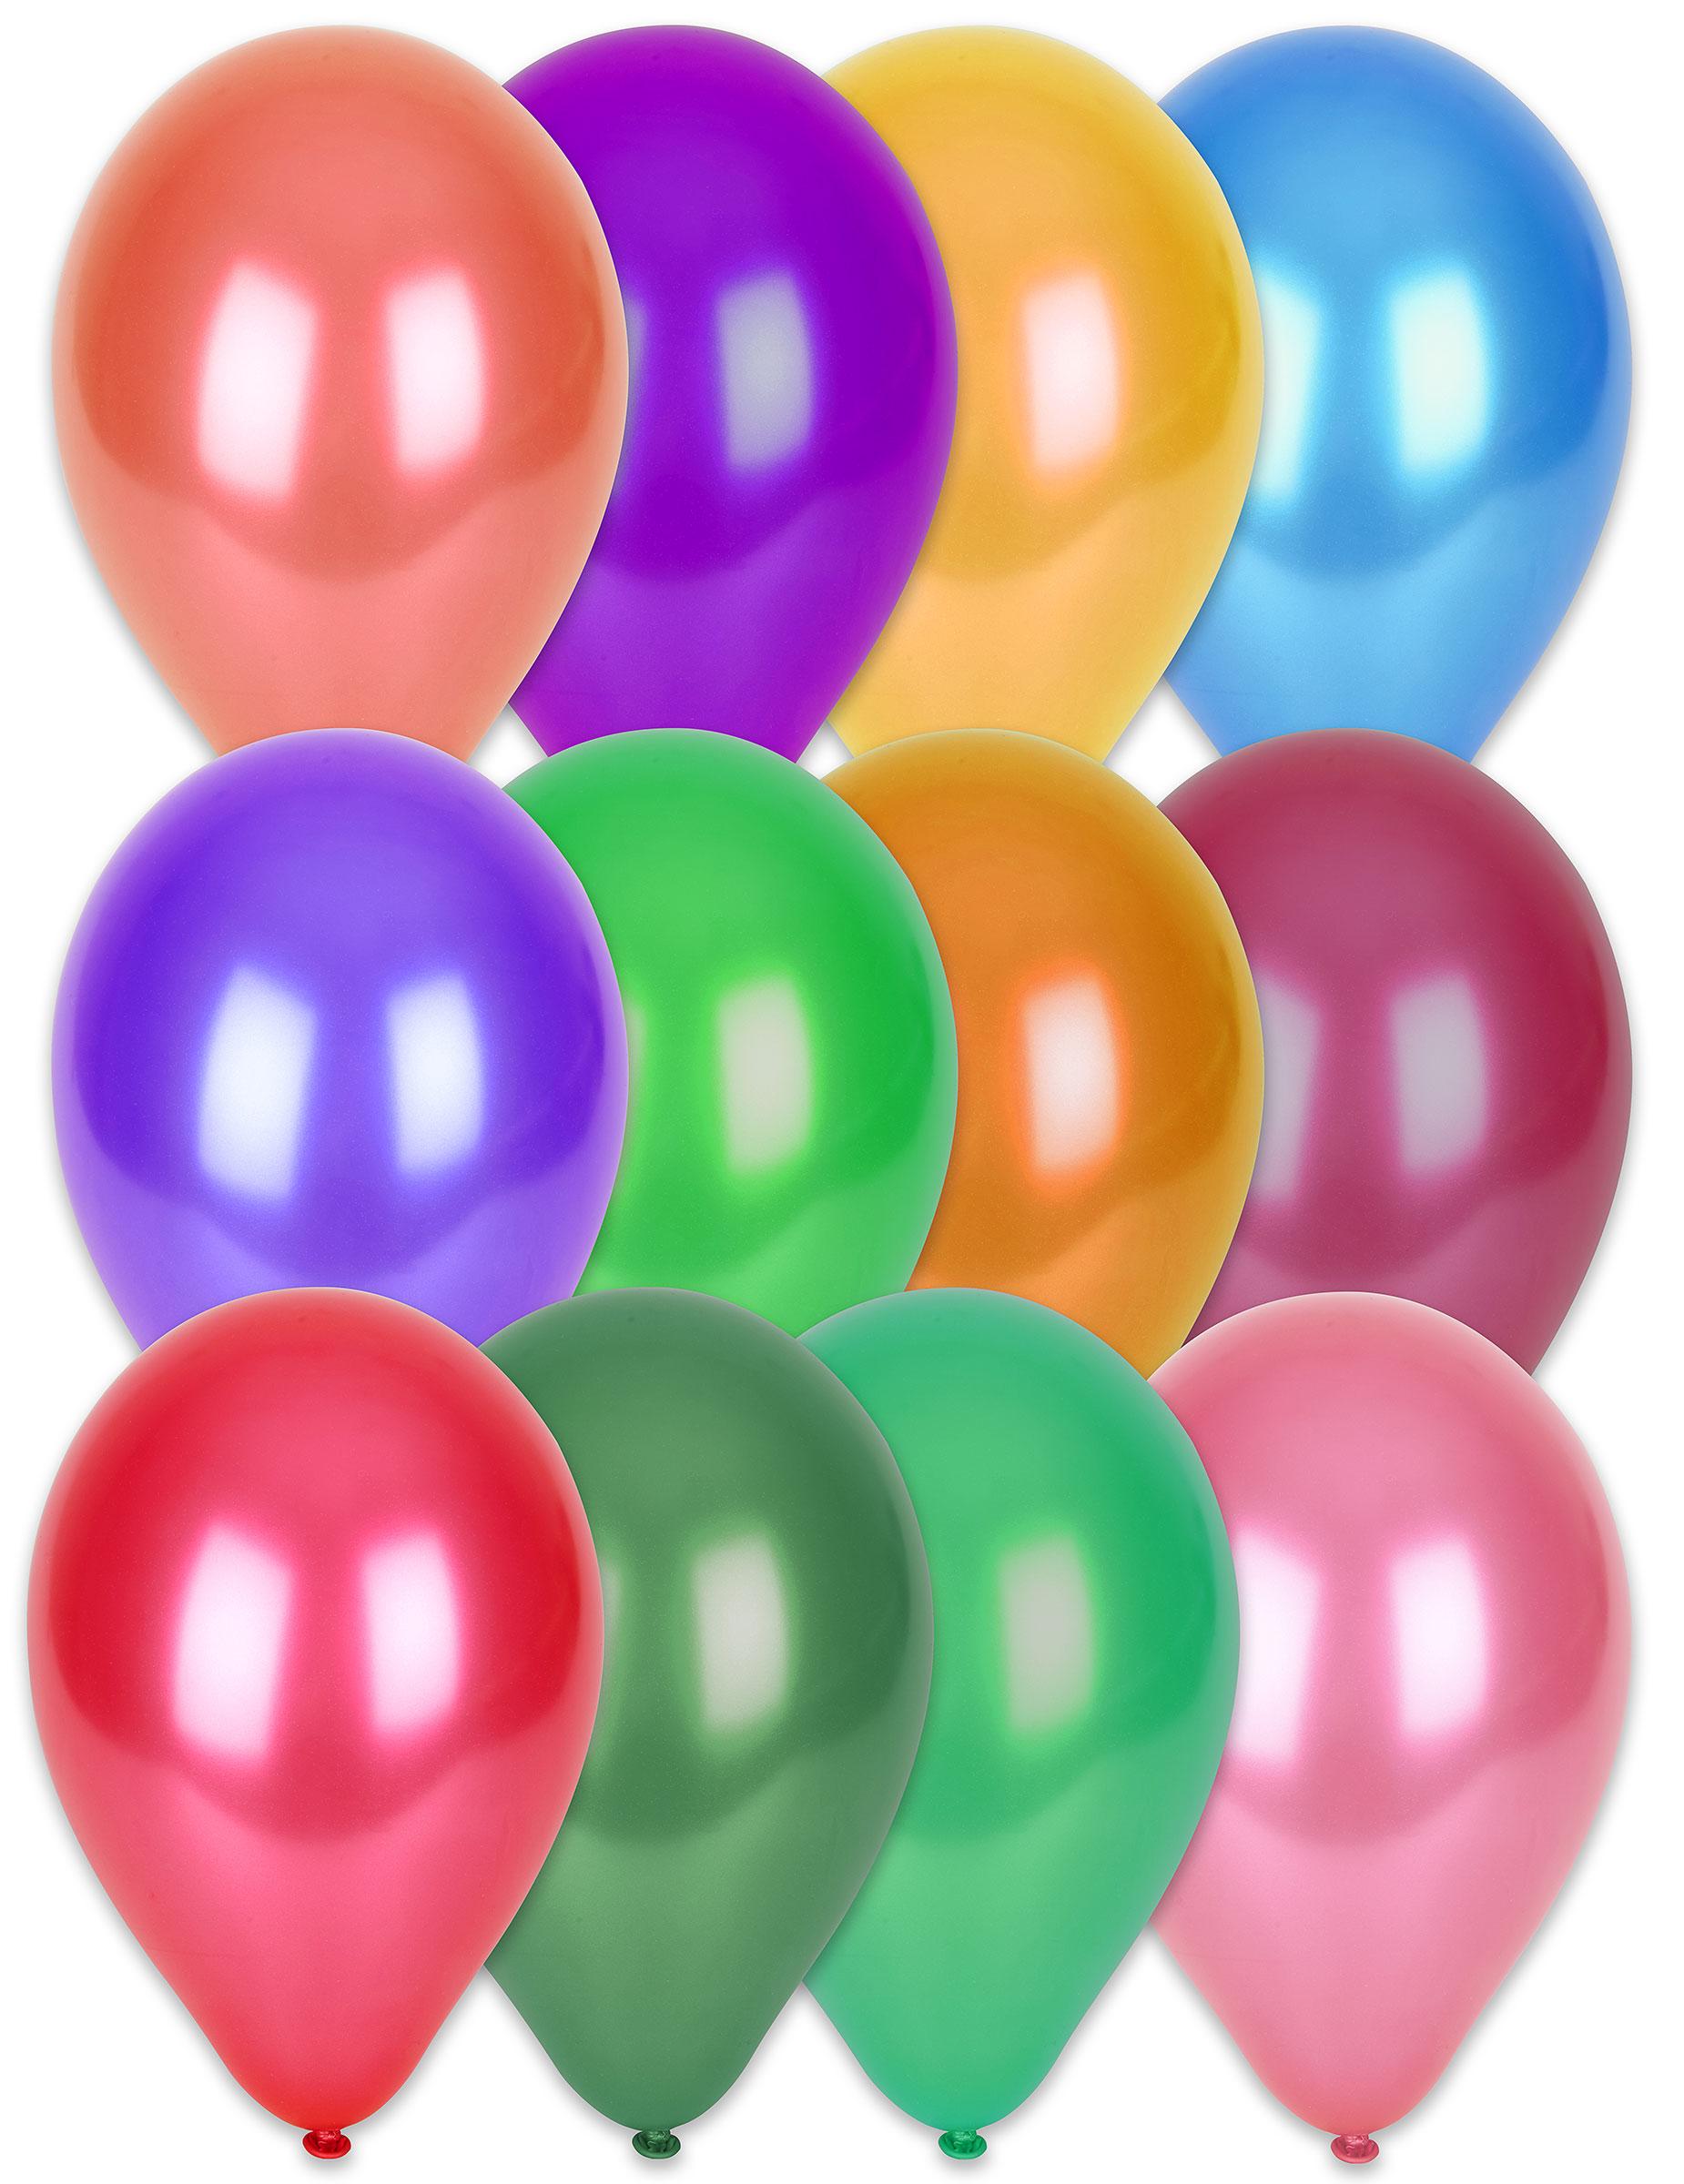 100 globos colores matalizados 29 cm Decoraciny disfraces